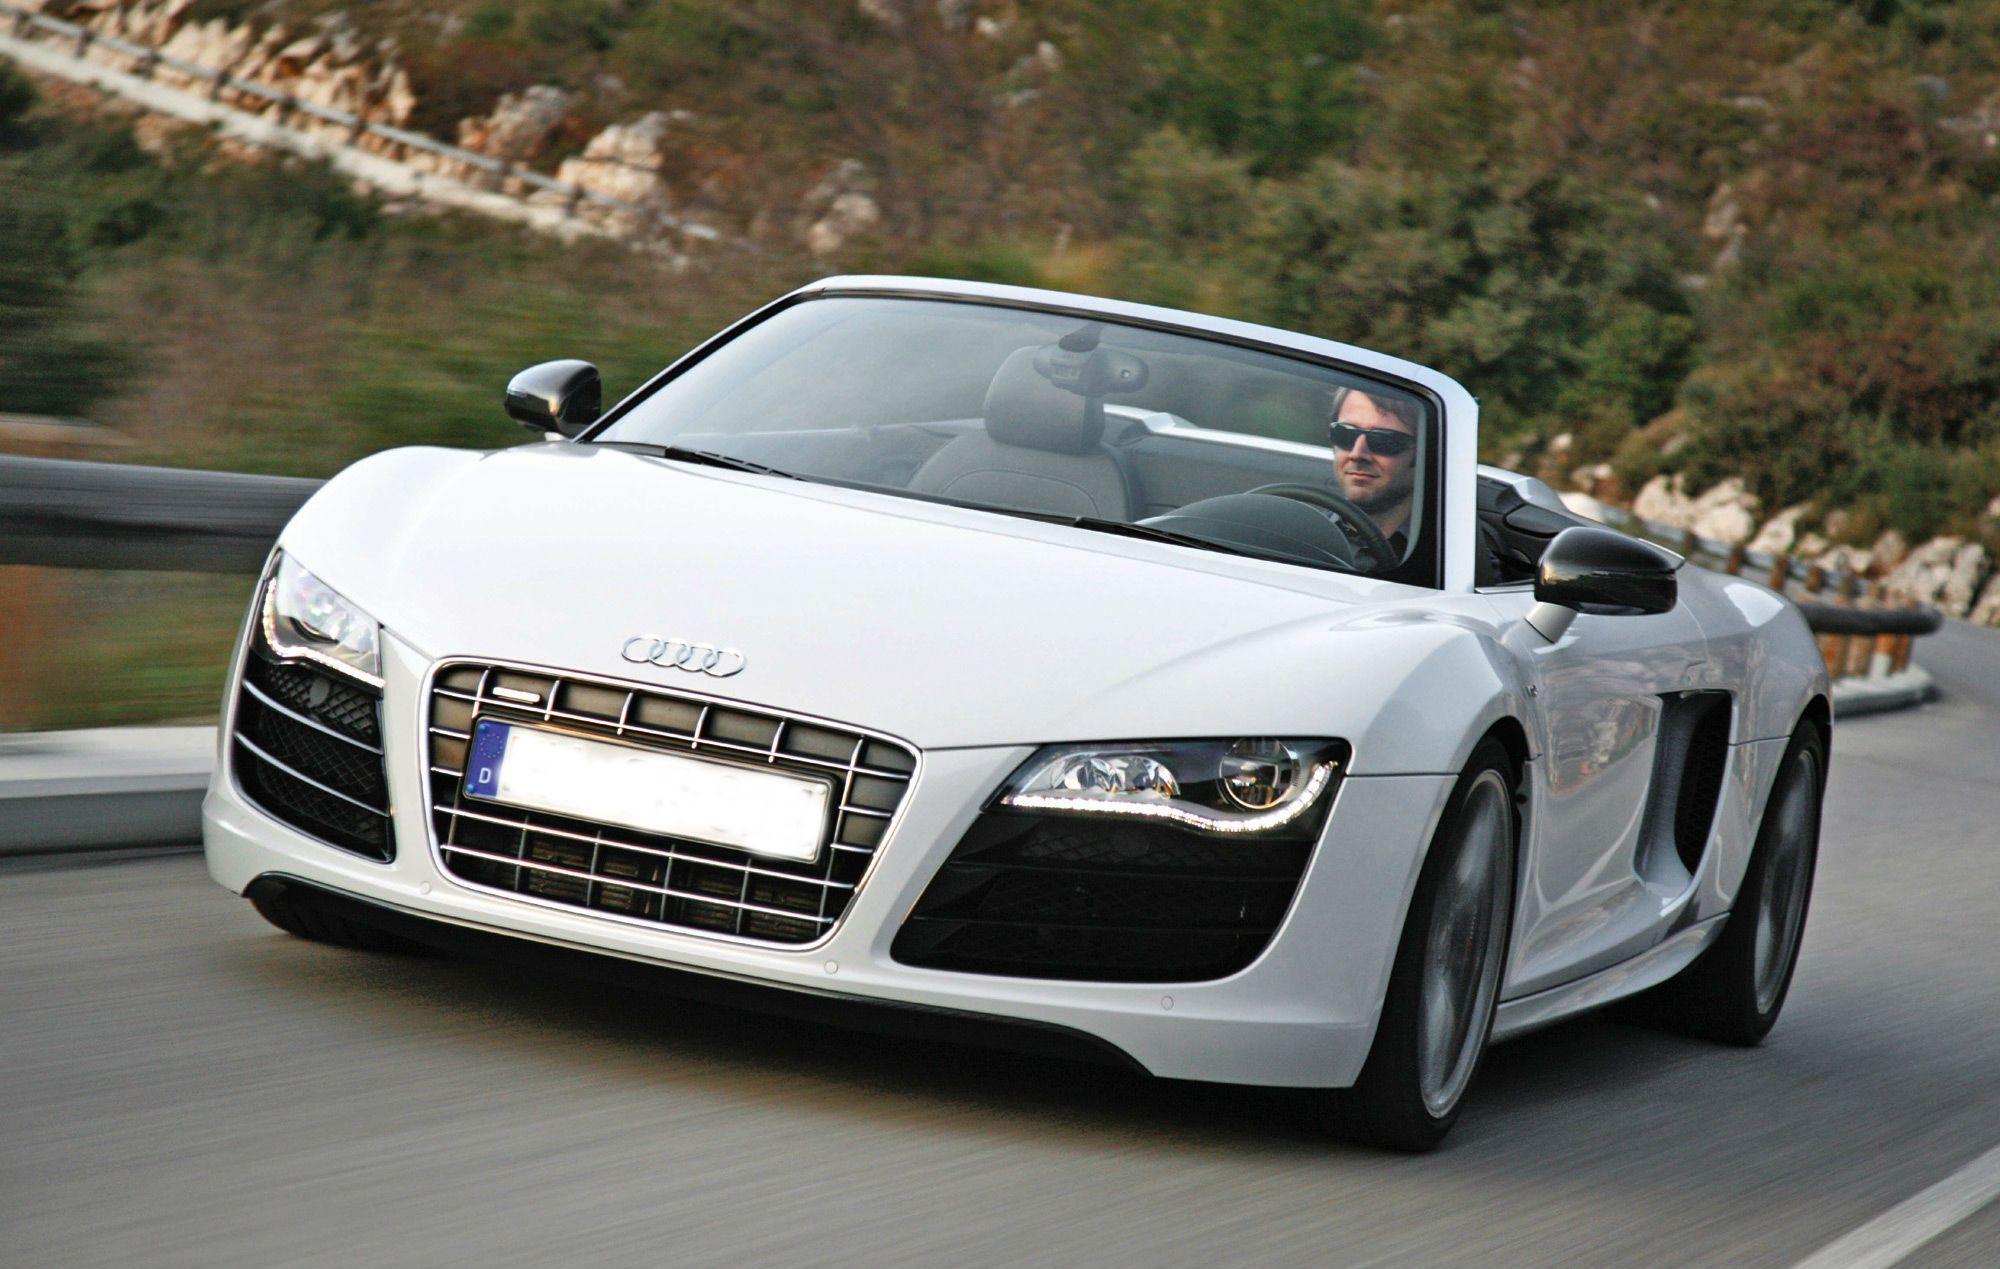 Audi R8 Spyder V10 Car For Hire Audi Cars Audi Audi R8 Spyder